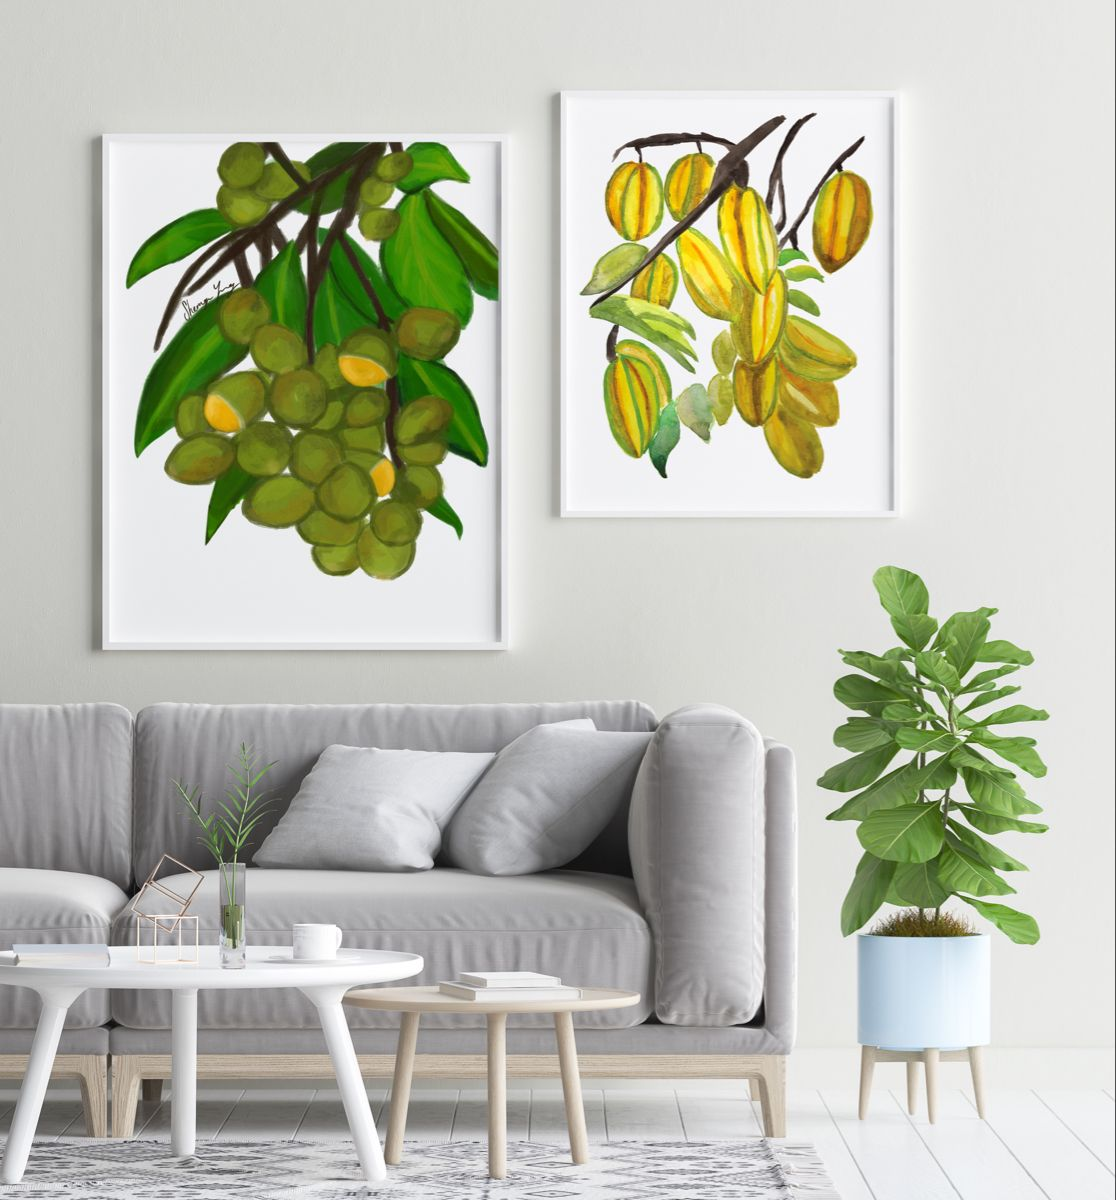 Guinep and Star Fruit Art Prints #jamaican #caribbean #trinidad #guyana #art #printsforsale #blackowned #blackownedbusiness